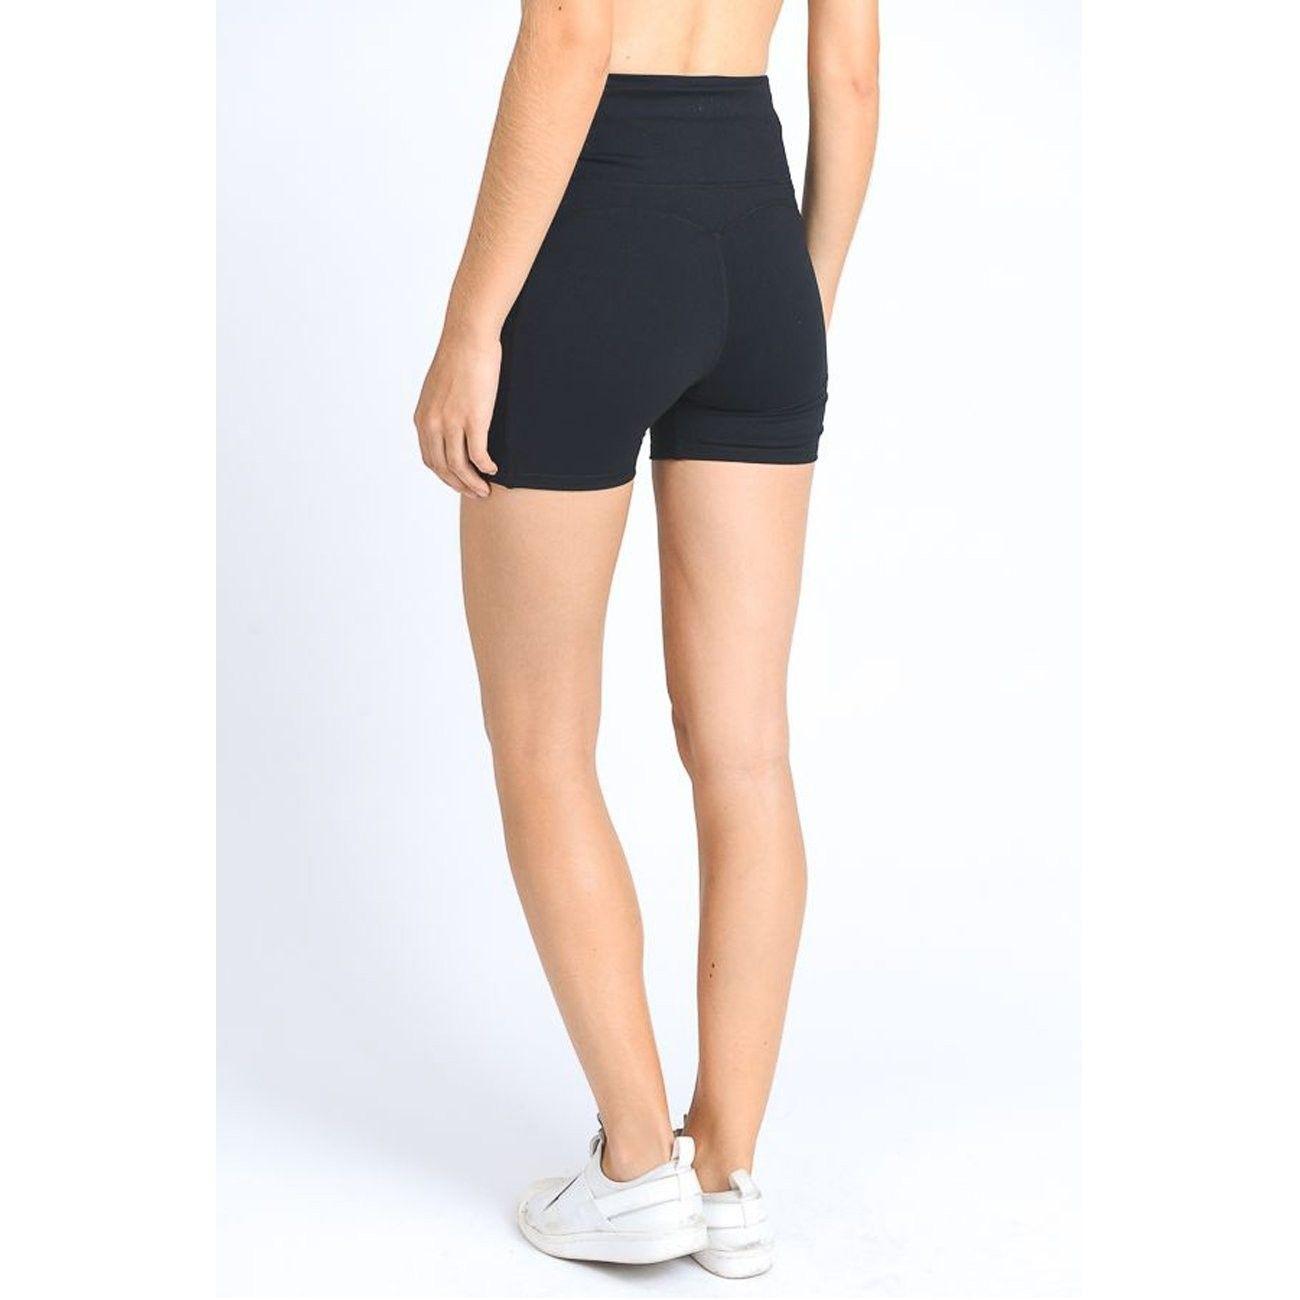 Women's High Waist Tummy Control Workout & Training Shorts - Black - CK18E43NA8T - Sports & Fitness...